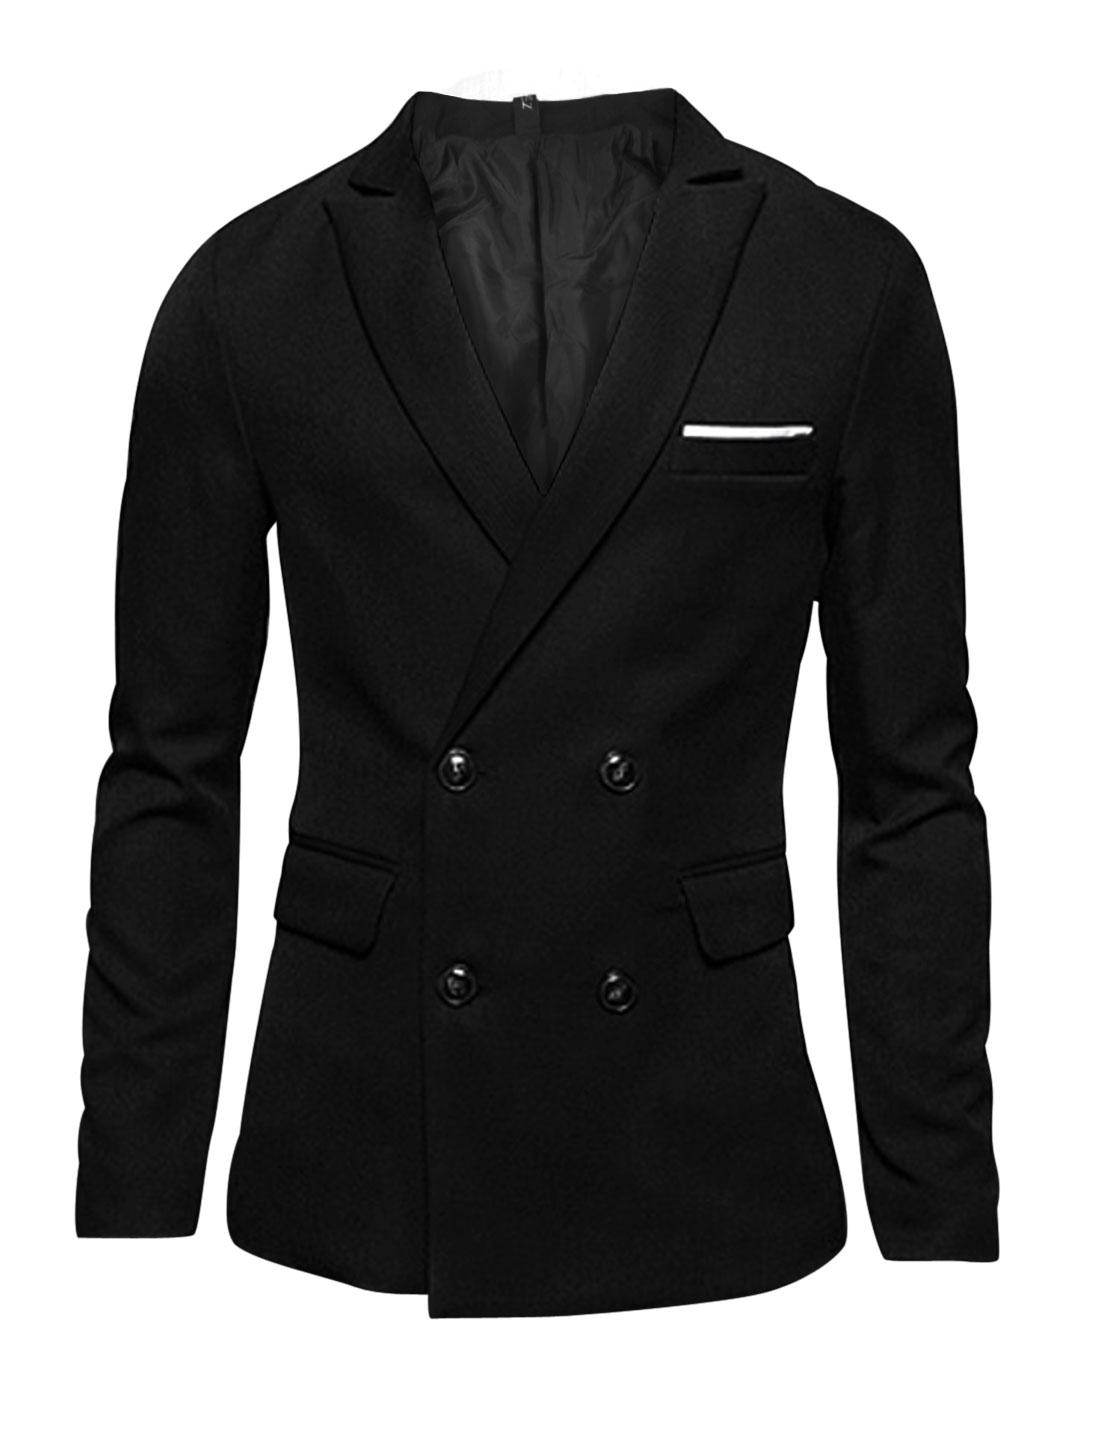 Men Black Double Breasted Peaked Lapel Split Back Blazer Jacket M